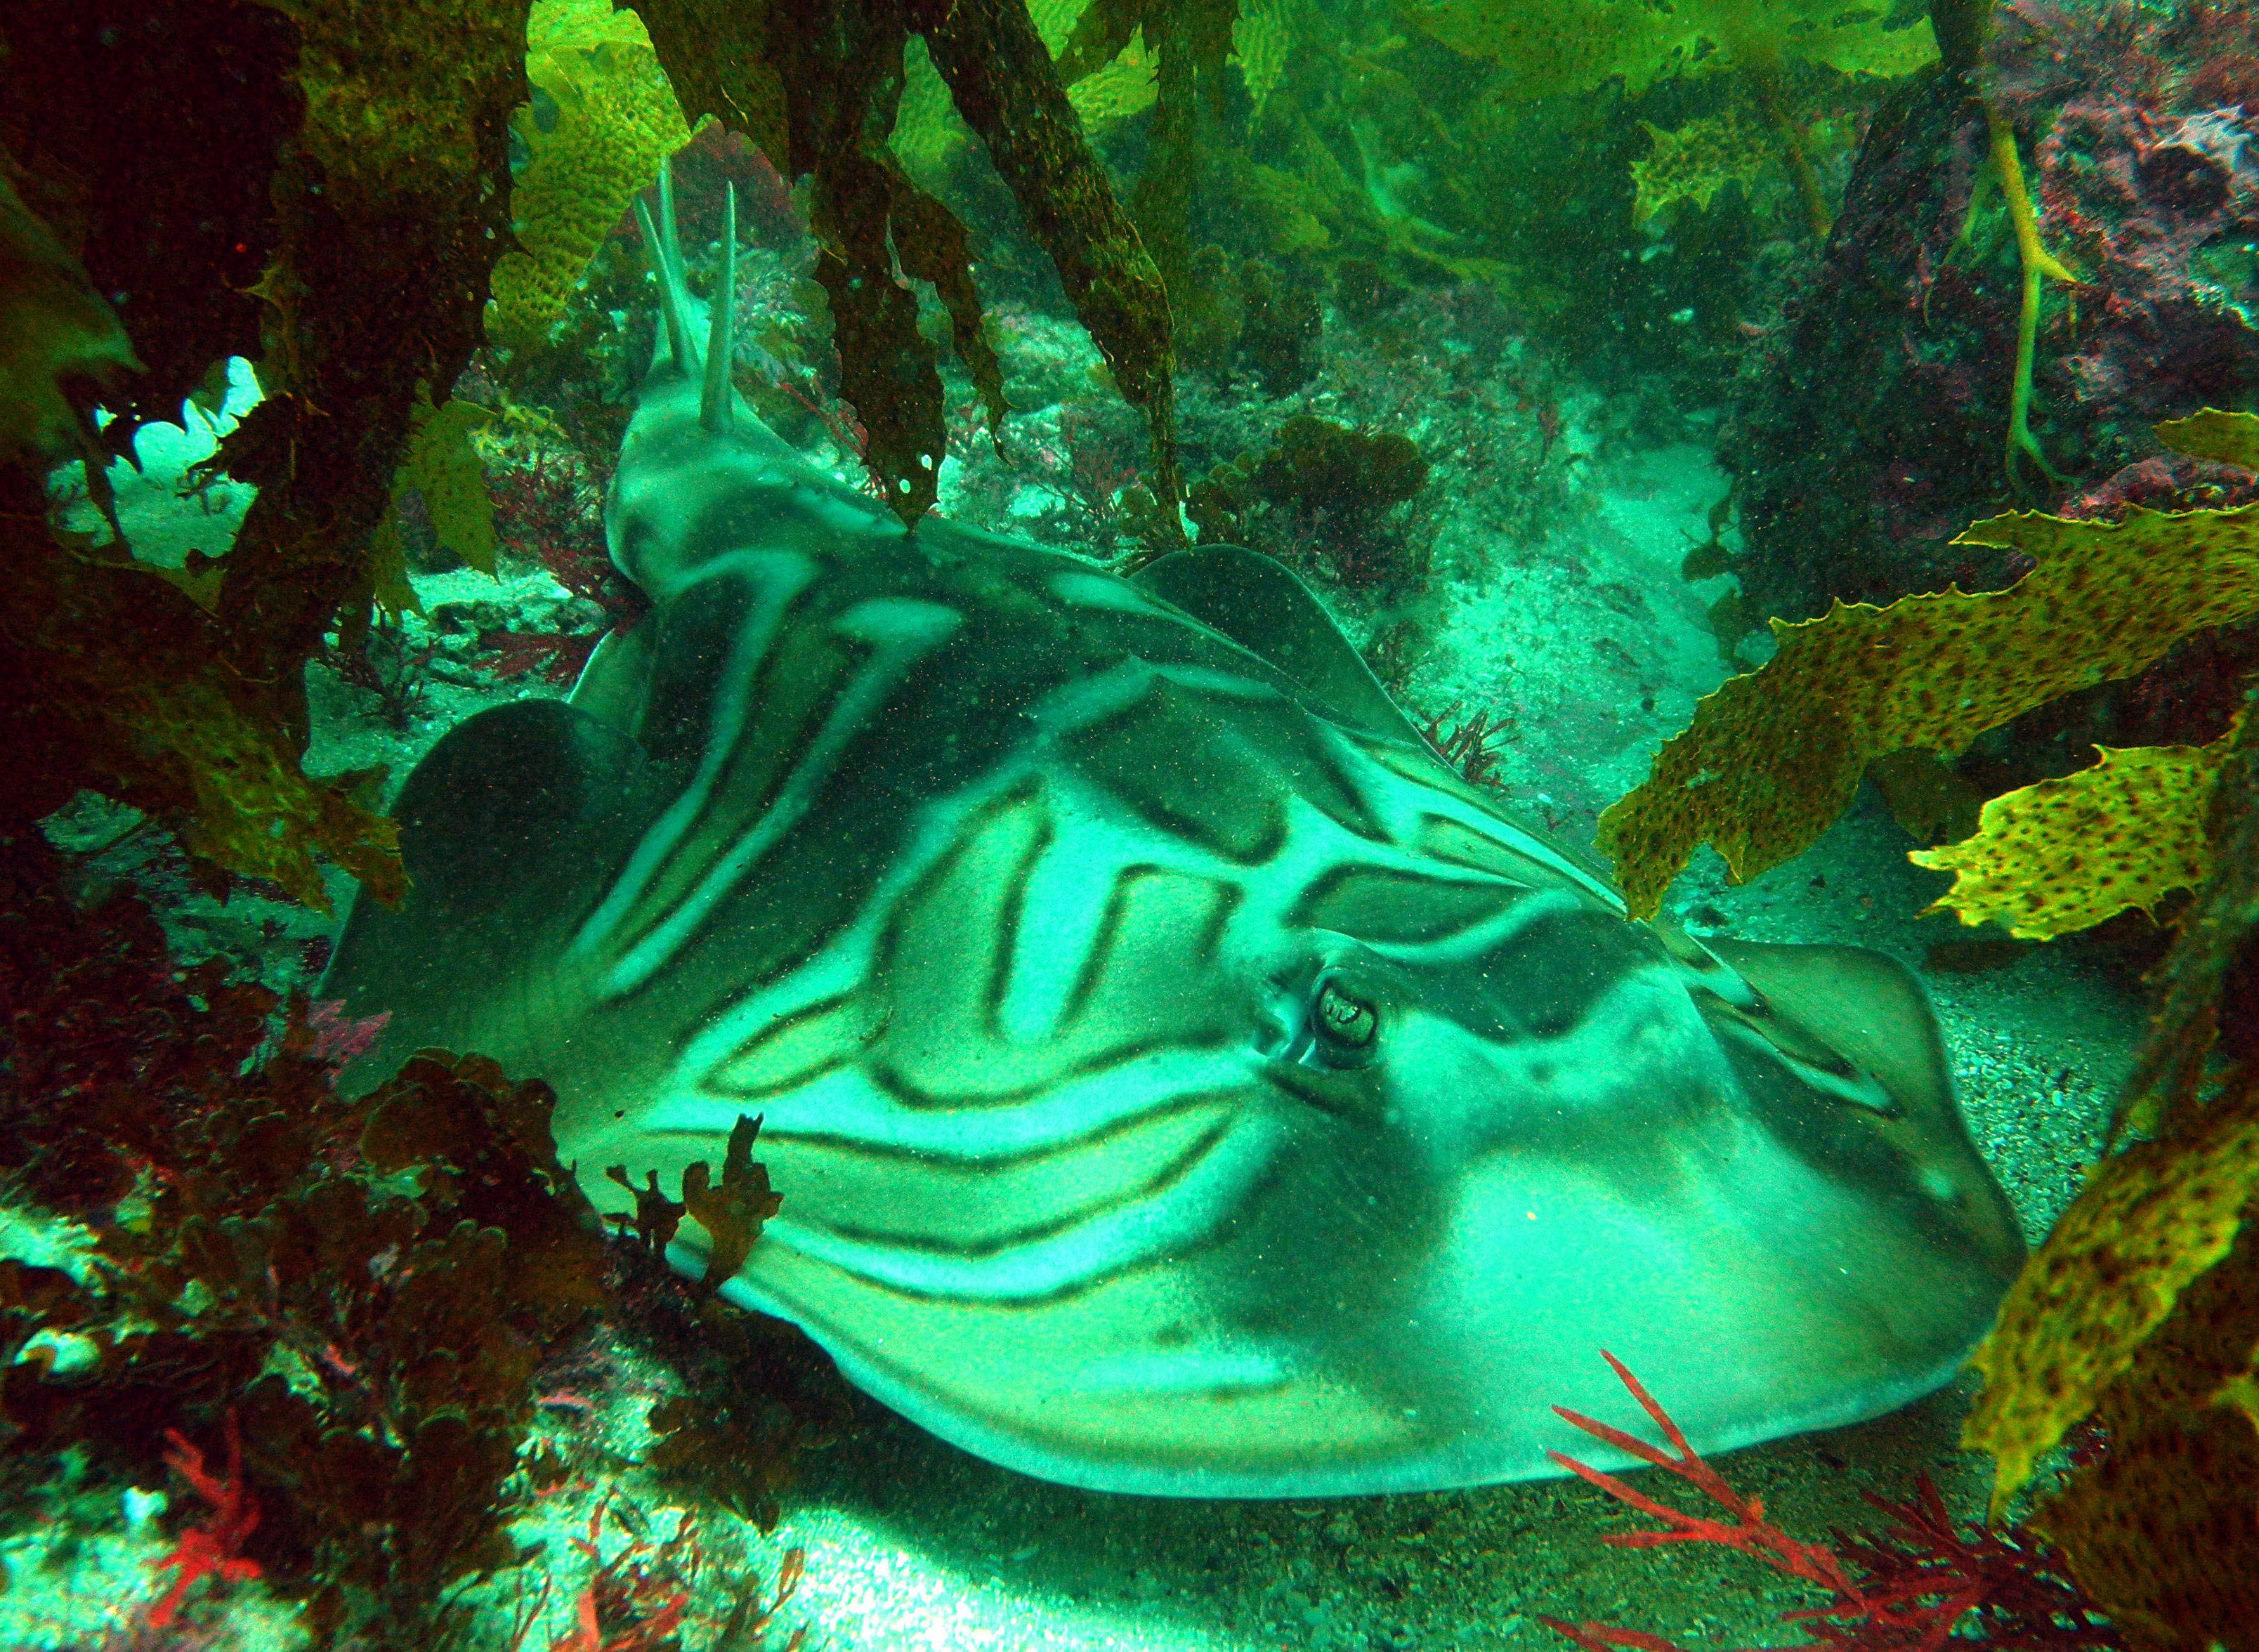 Image of Banjo Shark